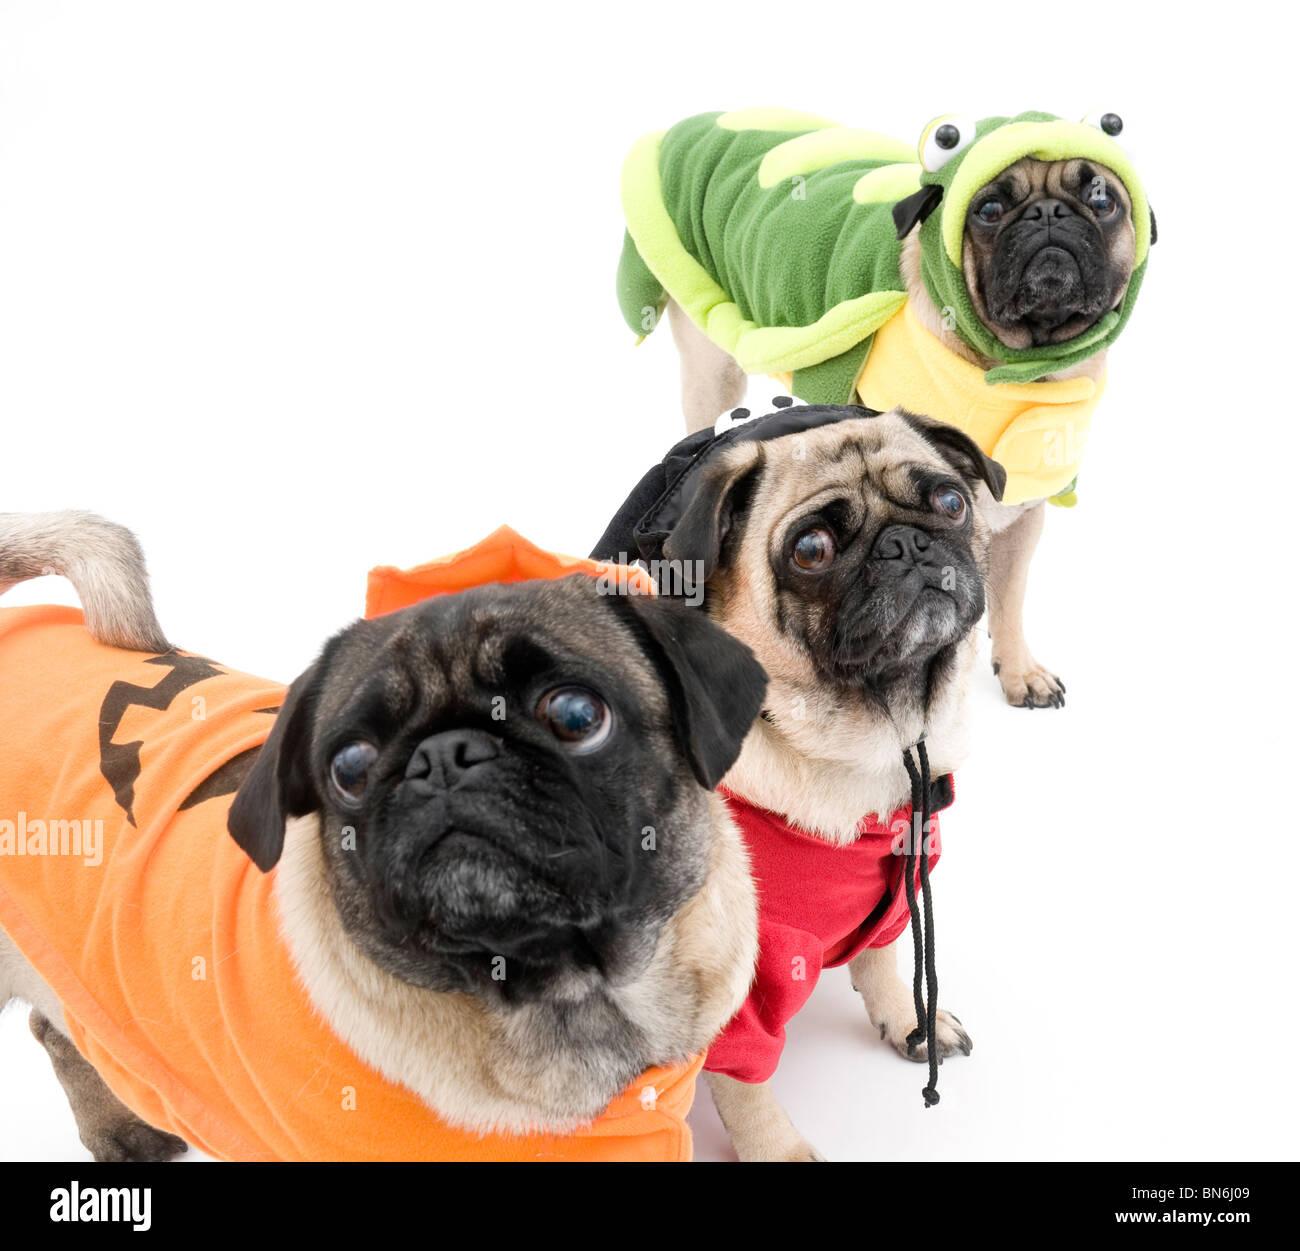 Three Pugs Dressed Up for Halloween - Stock Image